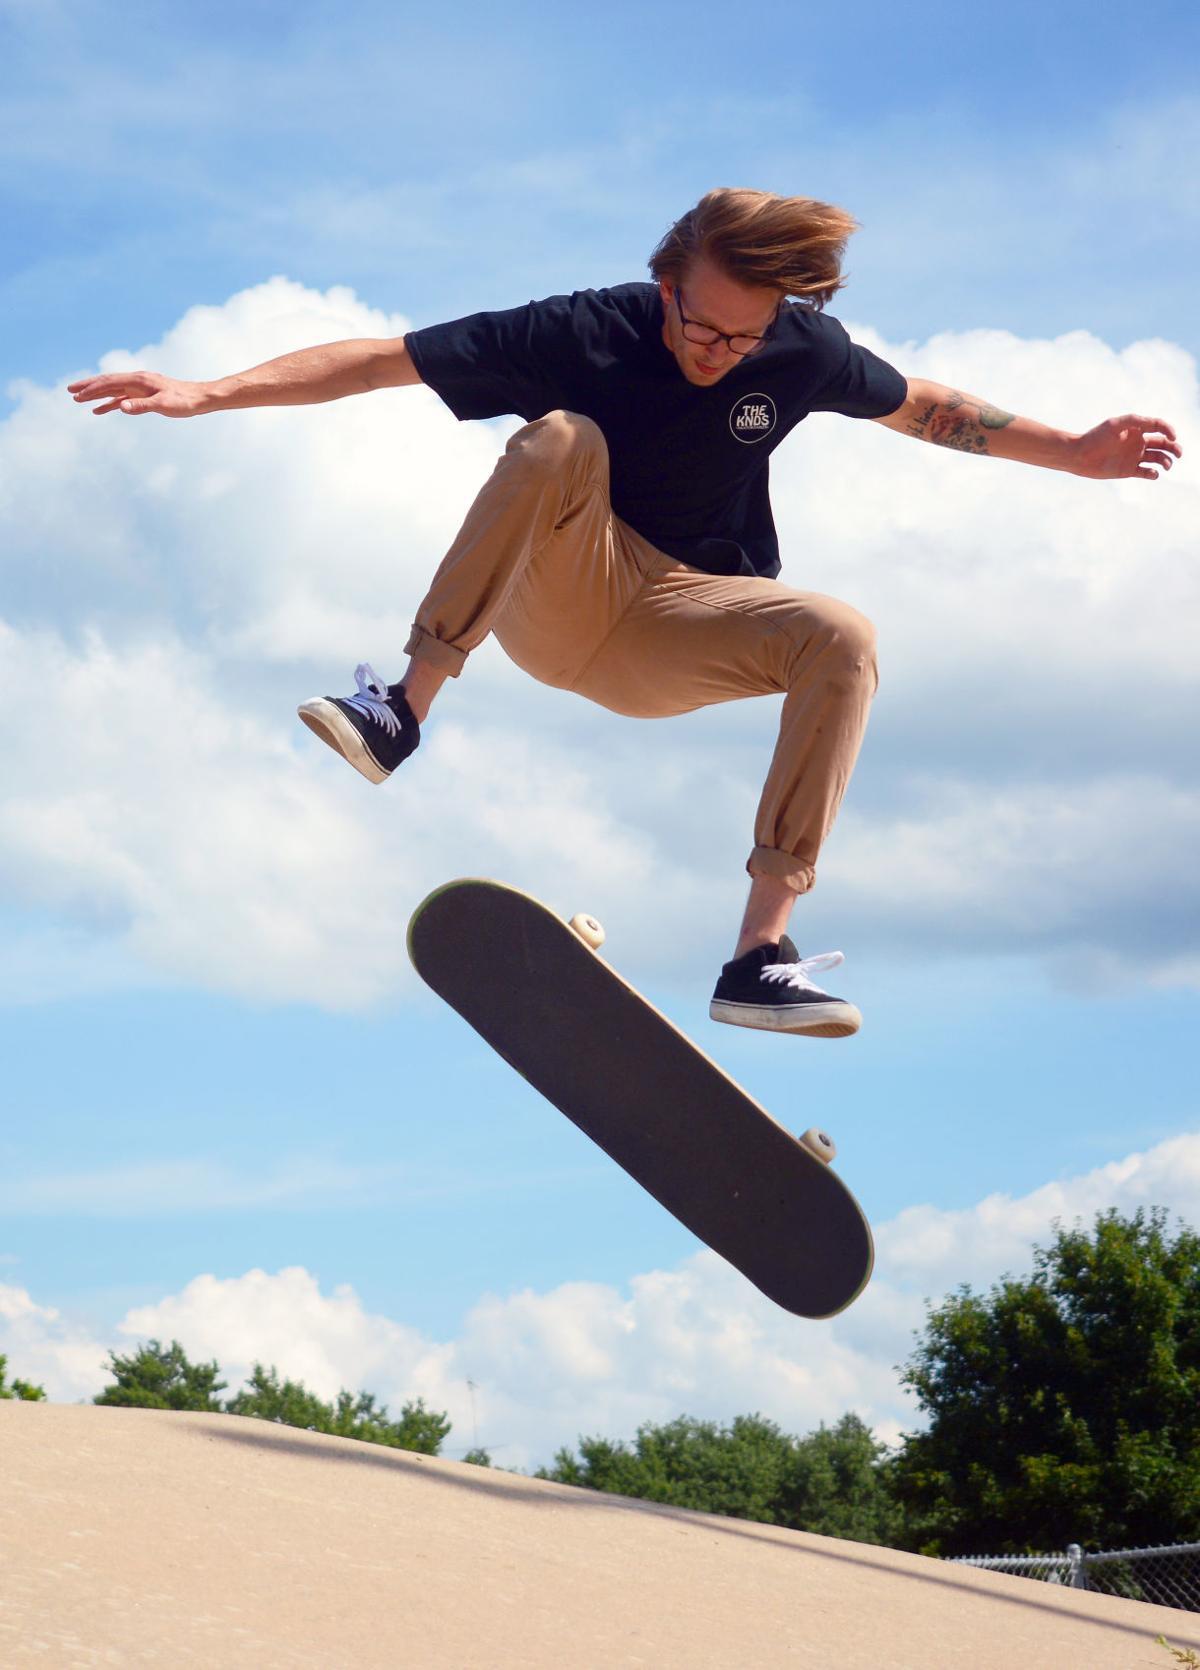 Trent Maxwel skateboarding (copy)